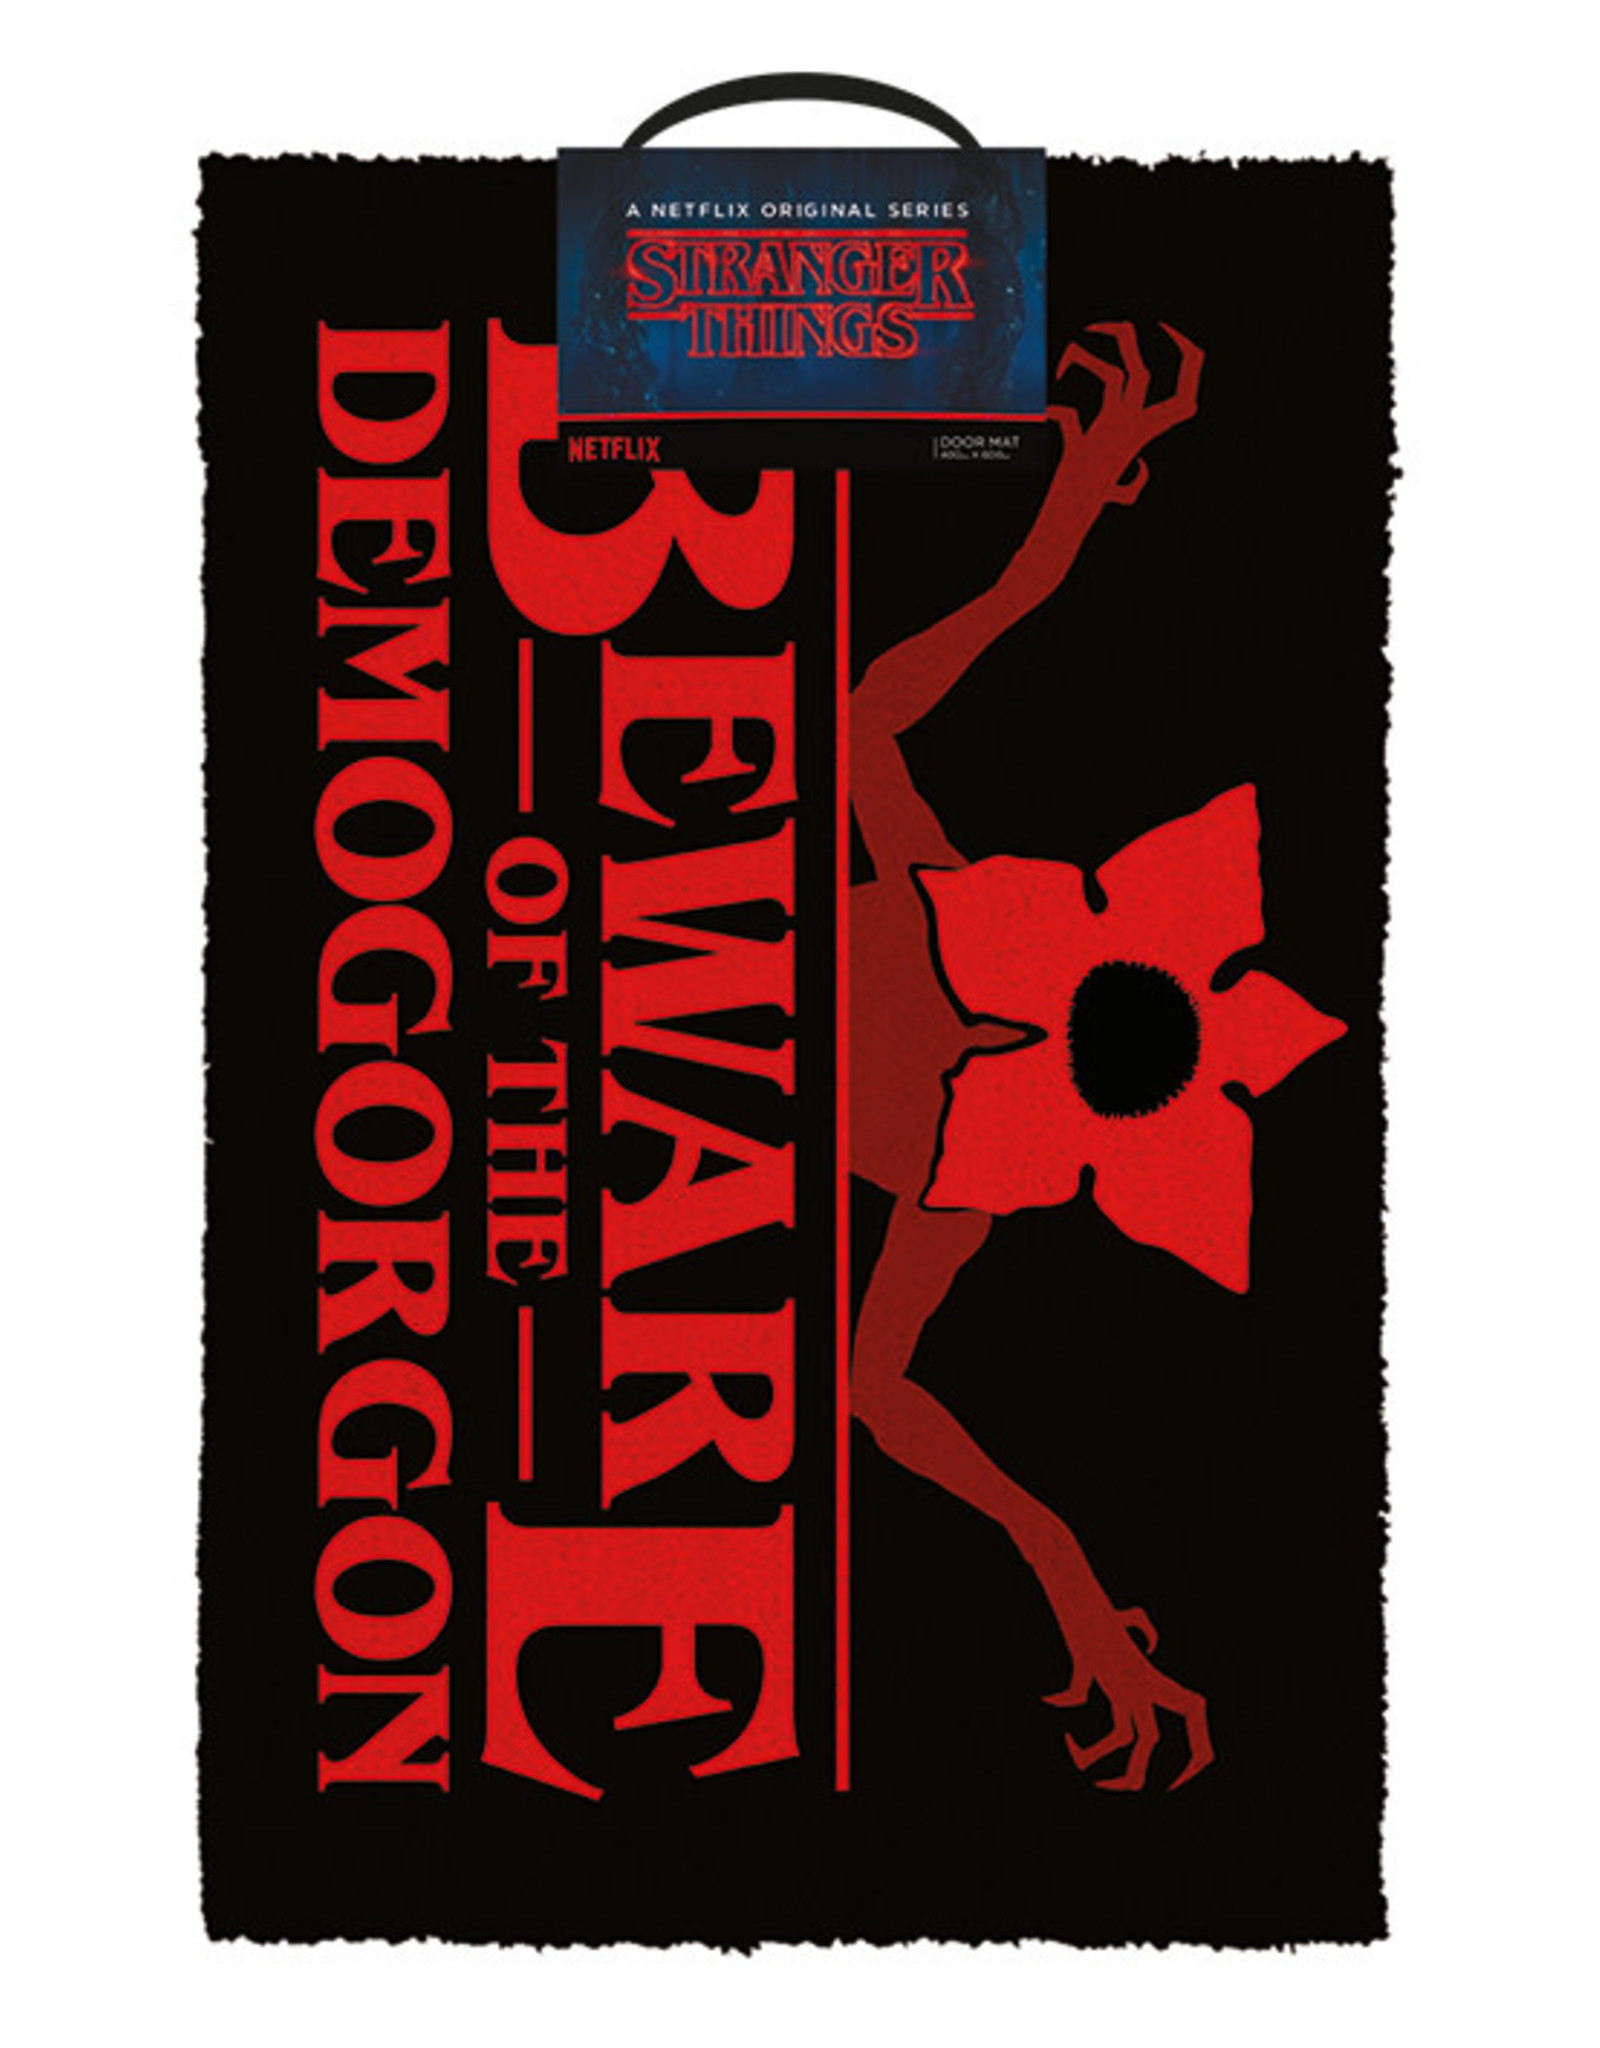 STRANGER THINGS Doormat 40x60 - Beware of the Demogorgon